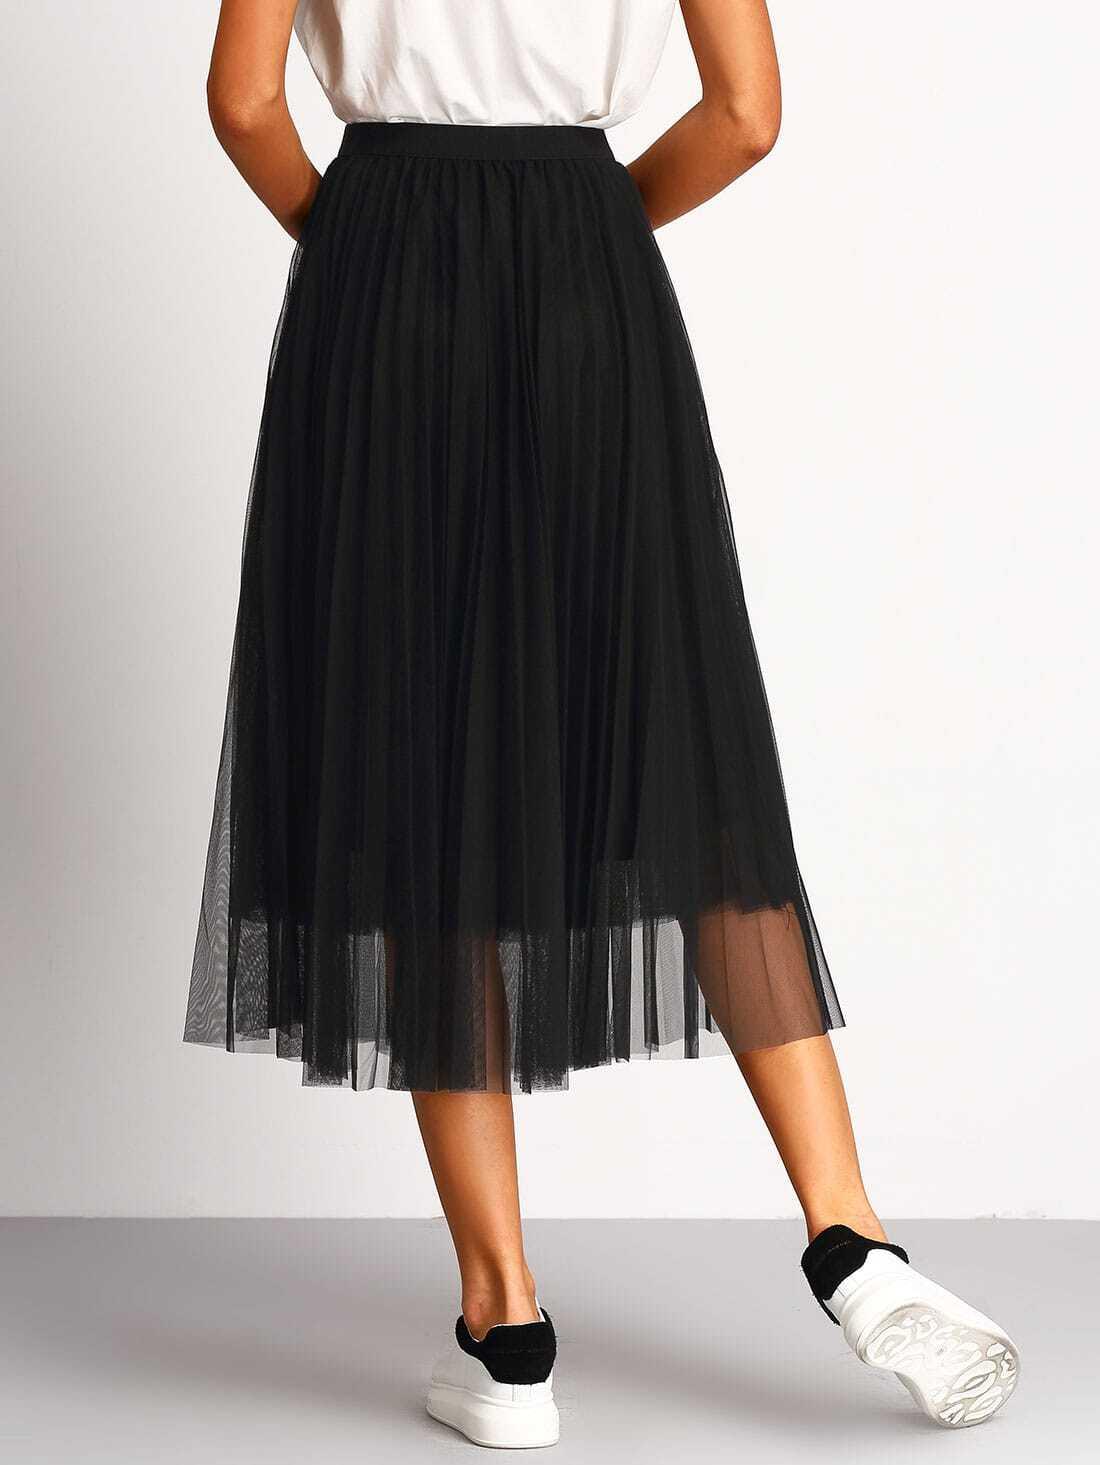 Jupe grande taille lastique pour femmes - Wittinternational